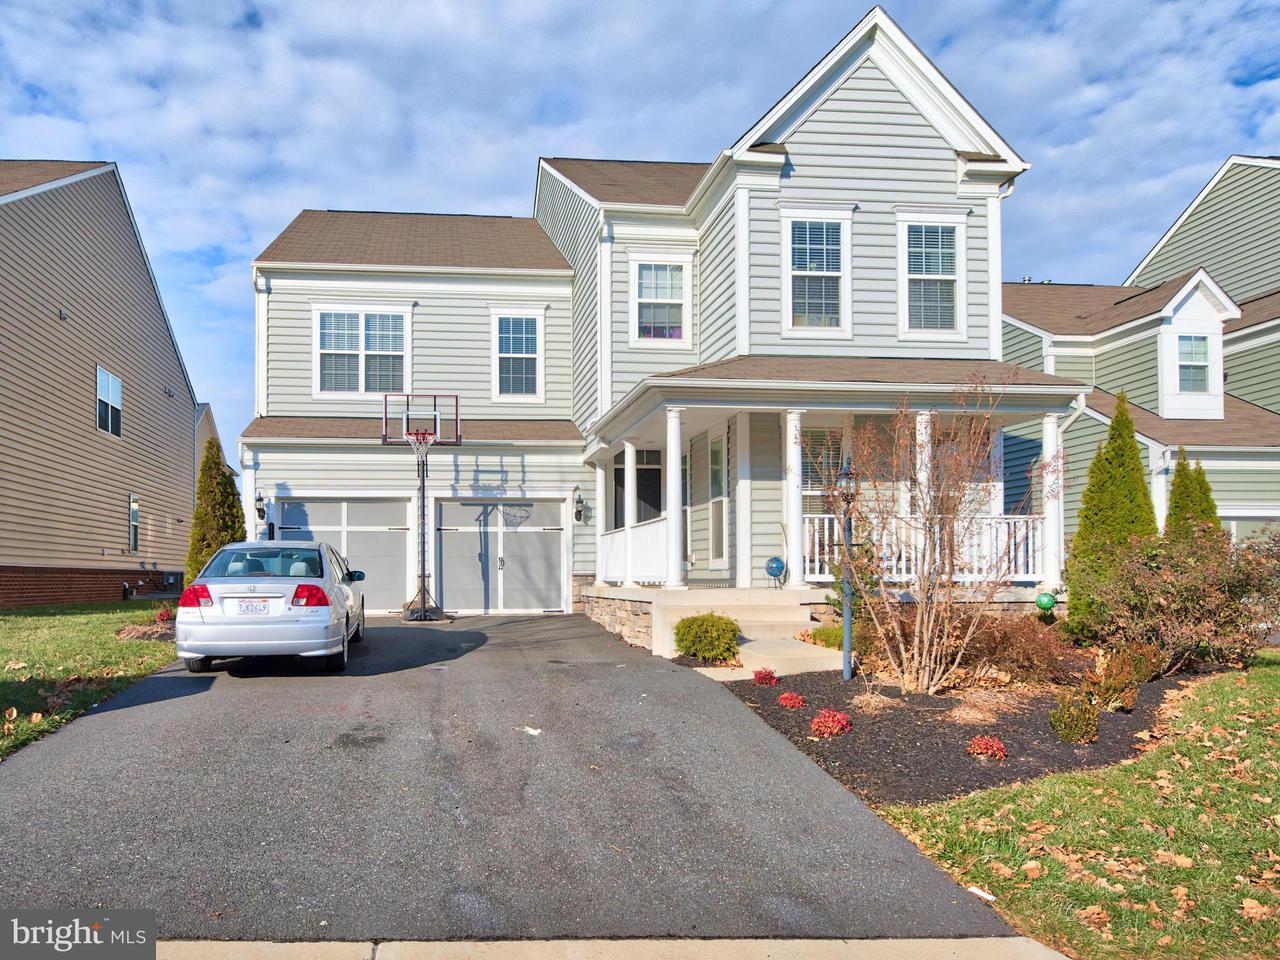 Single Family Home for Sale at 42622 Callalily Way 42622 Callalily Way Ashburn, Virginia 20148 United States